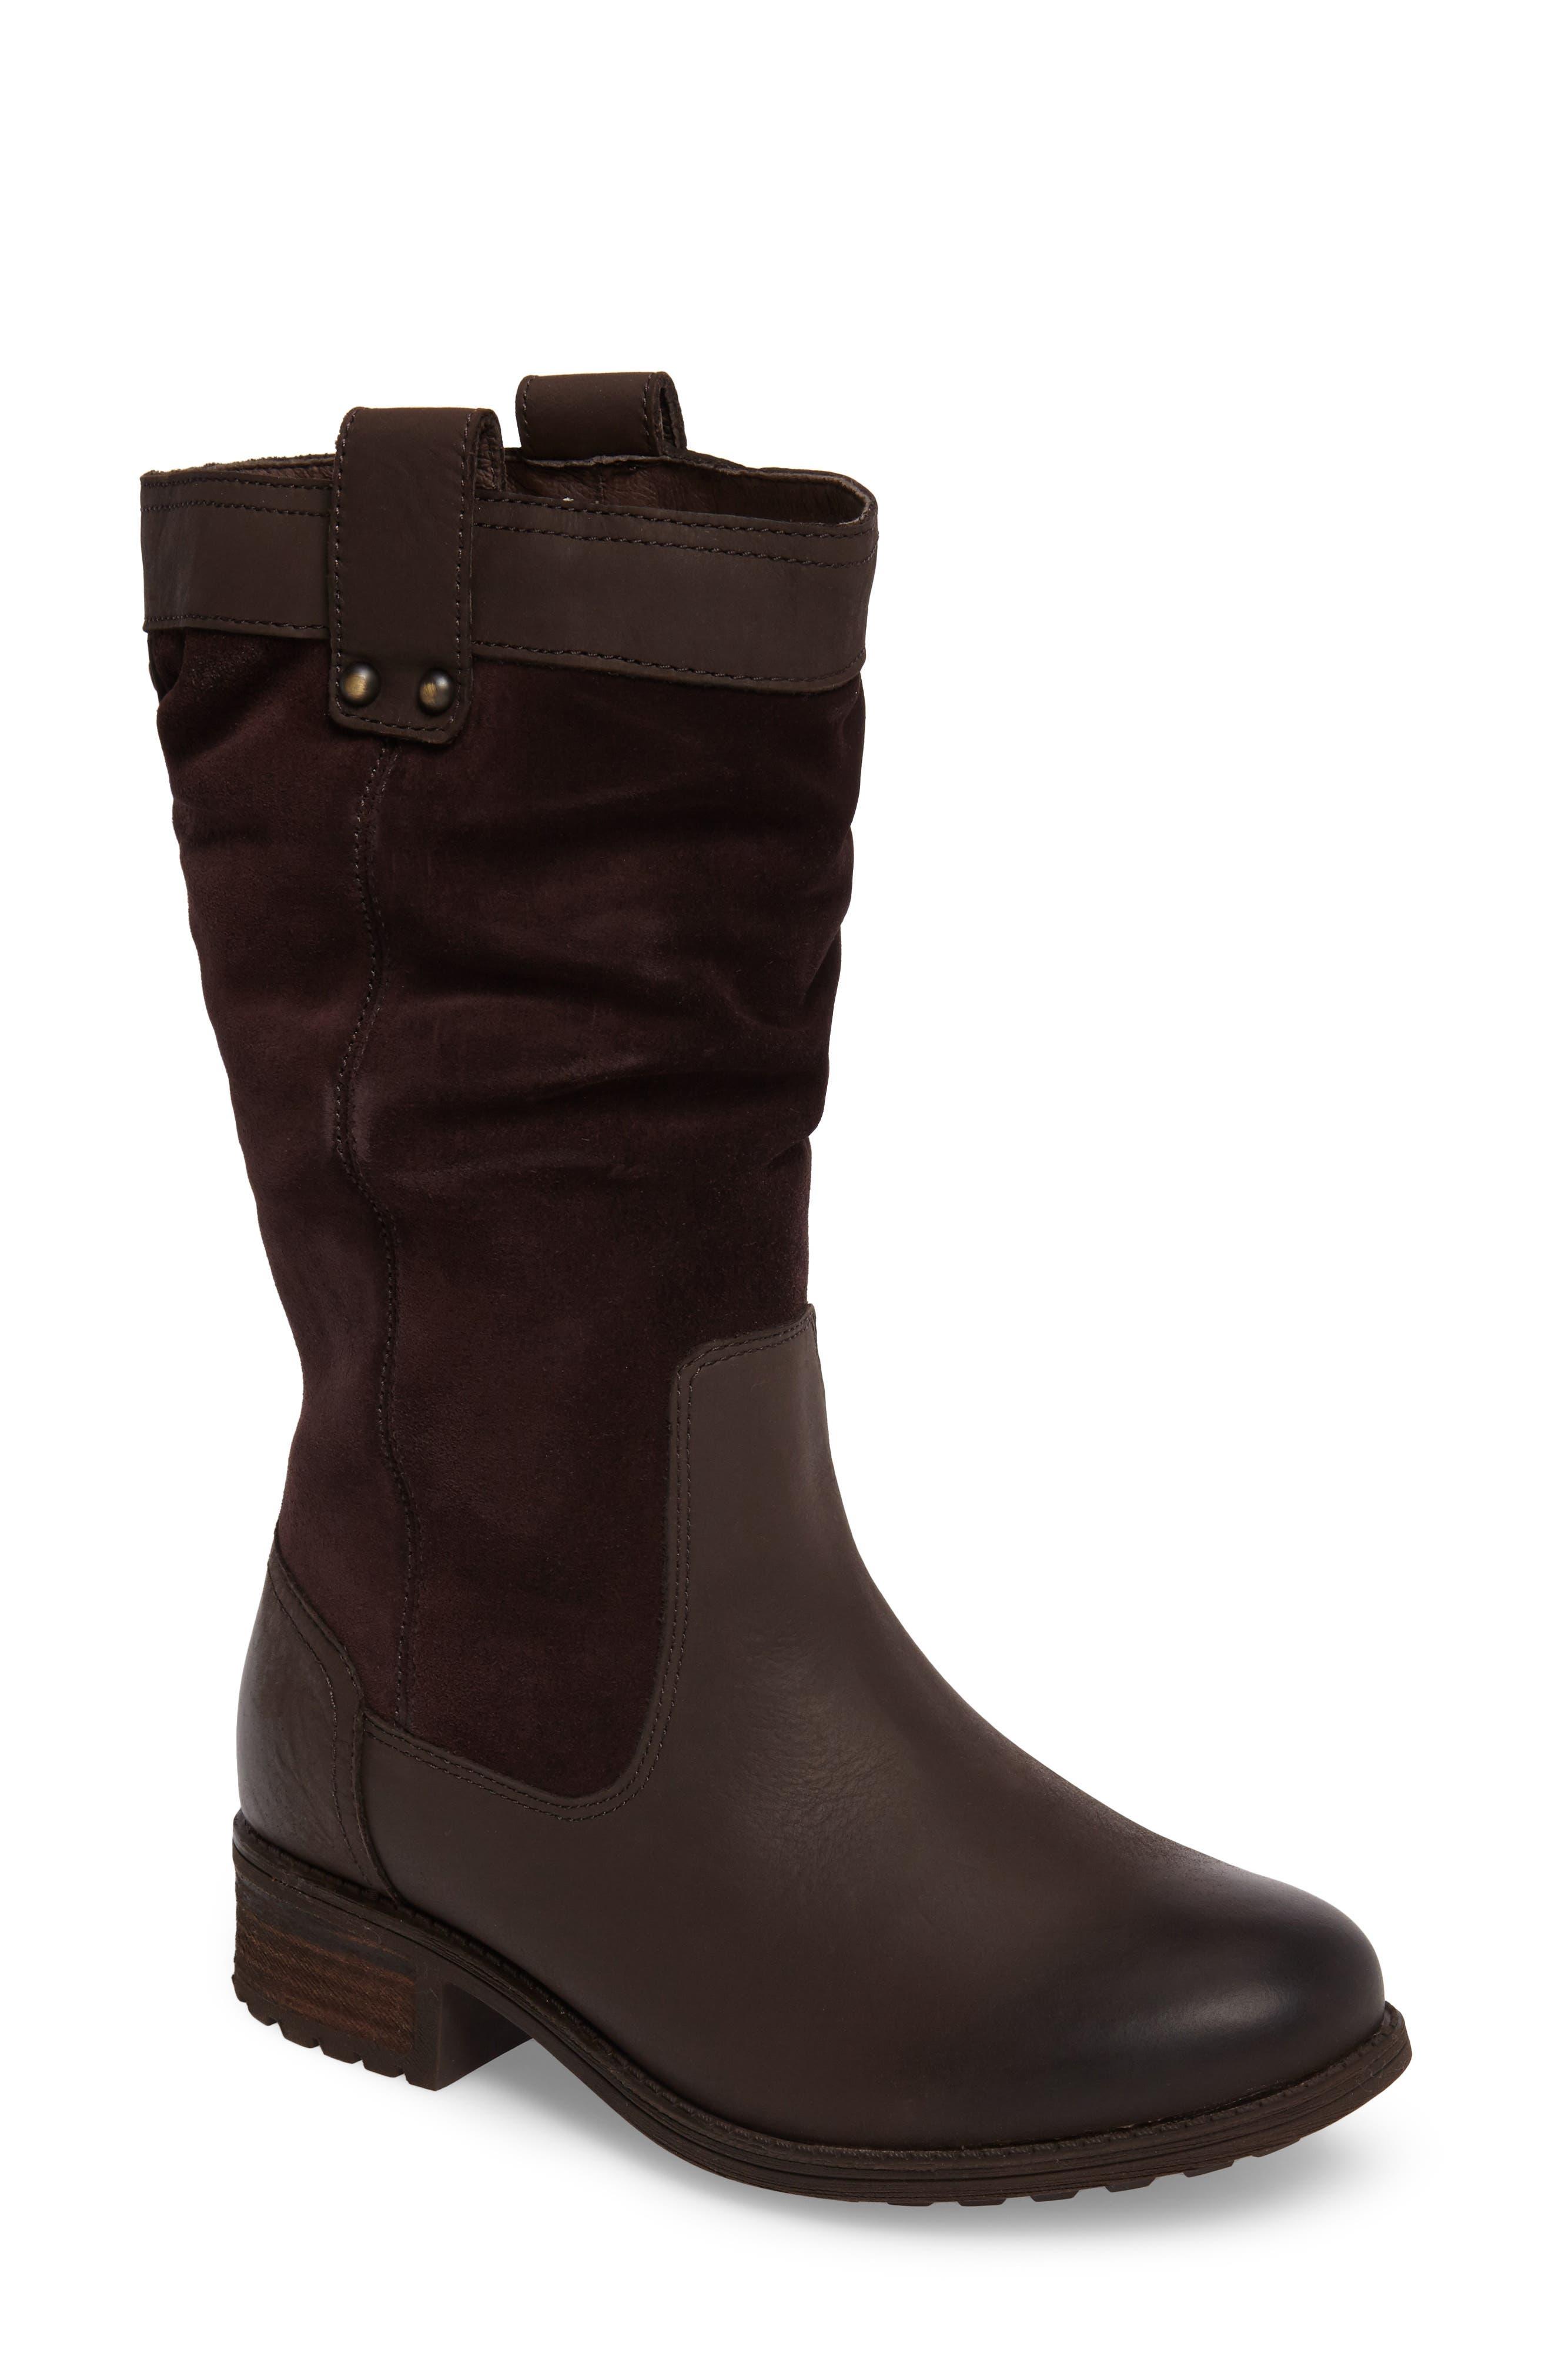 Main Image - UGG® Bruckner Water Resistant Slouch Boot (Women)